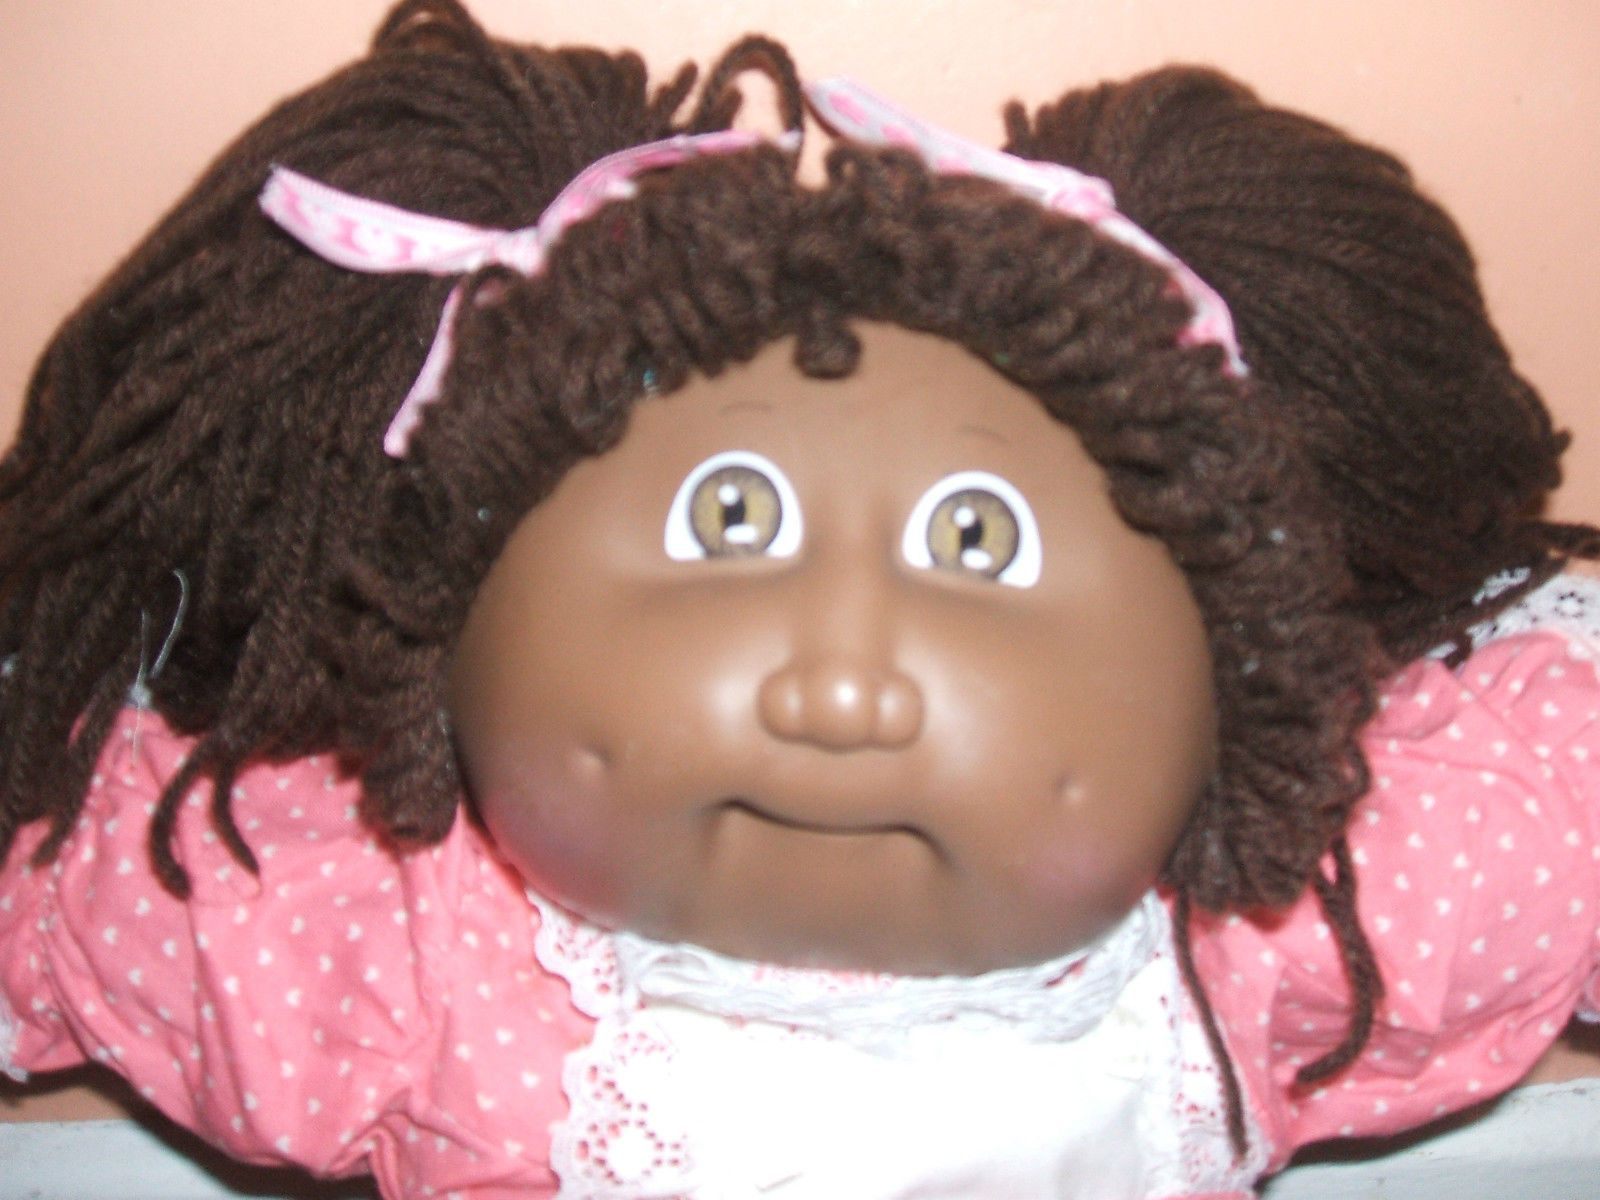 Vintage Cabbage Patch Doll Black Girl Beautiful Pink Dress 80s Retro Vintage Vintage Cabbage Patch Dolls Cabbage Patch Dolls Beautiful Pink